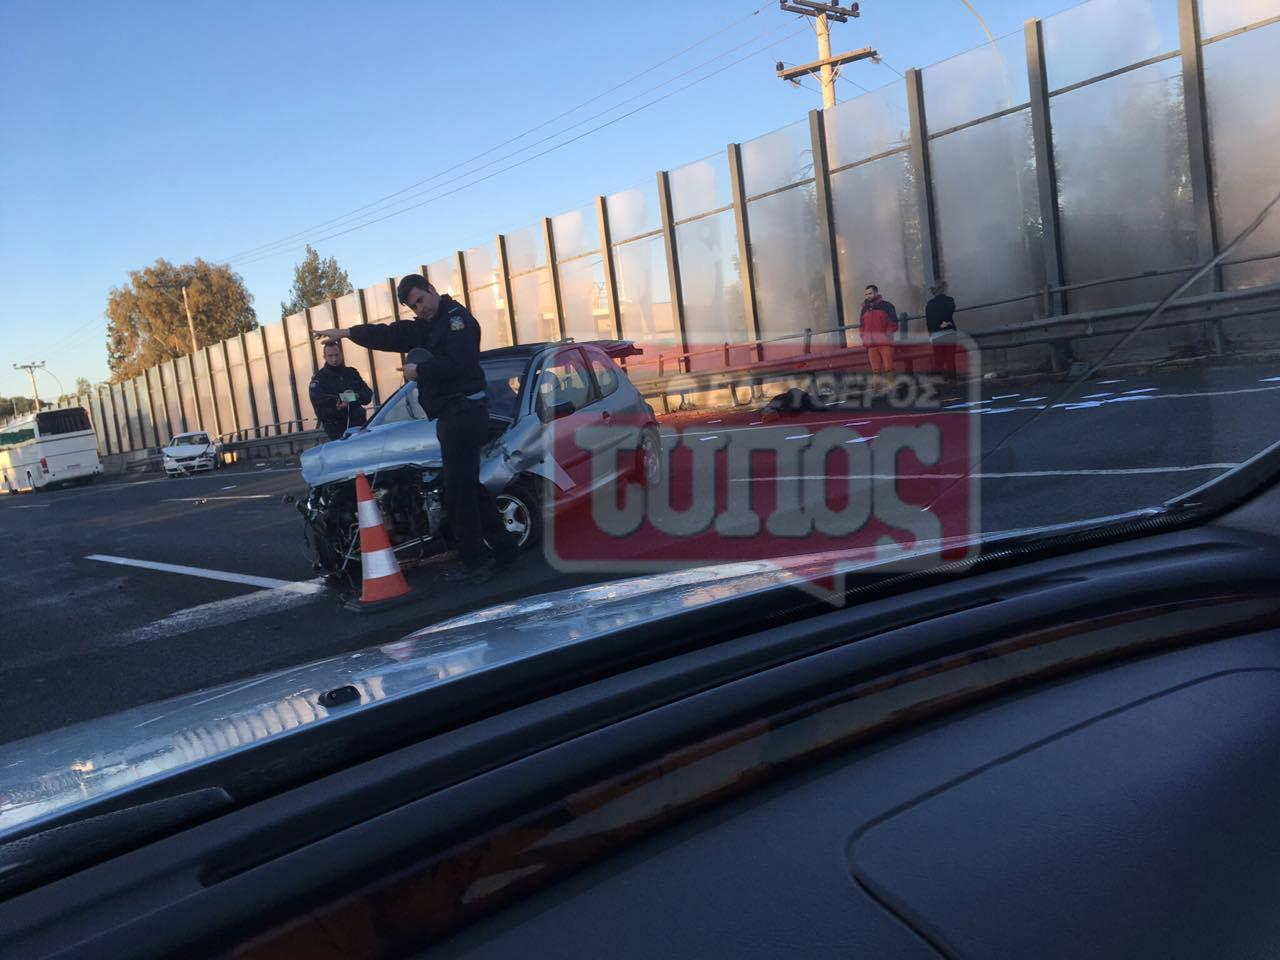 t5roxaio-ethinik-odos-traumaties-1300-6 Ατύχημα με τραυματία στην εθνική οδό: Μποτιλιάρισμα με ουρές χιλιομέτρων [εικόνες]